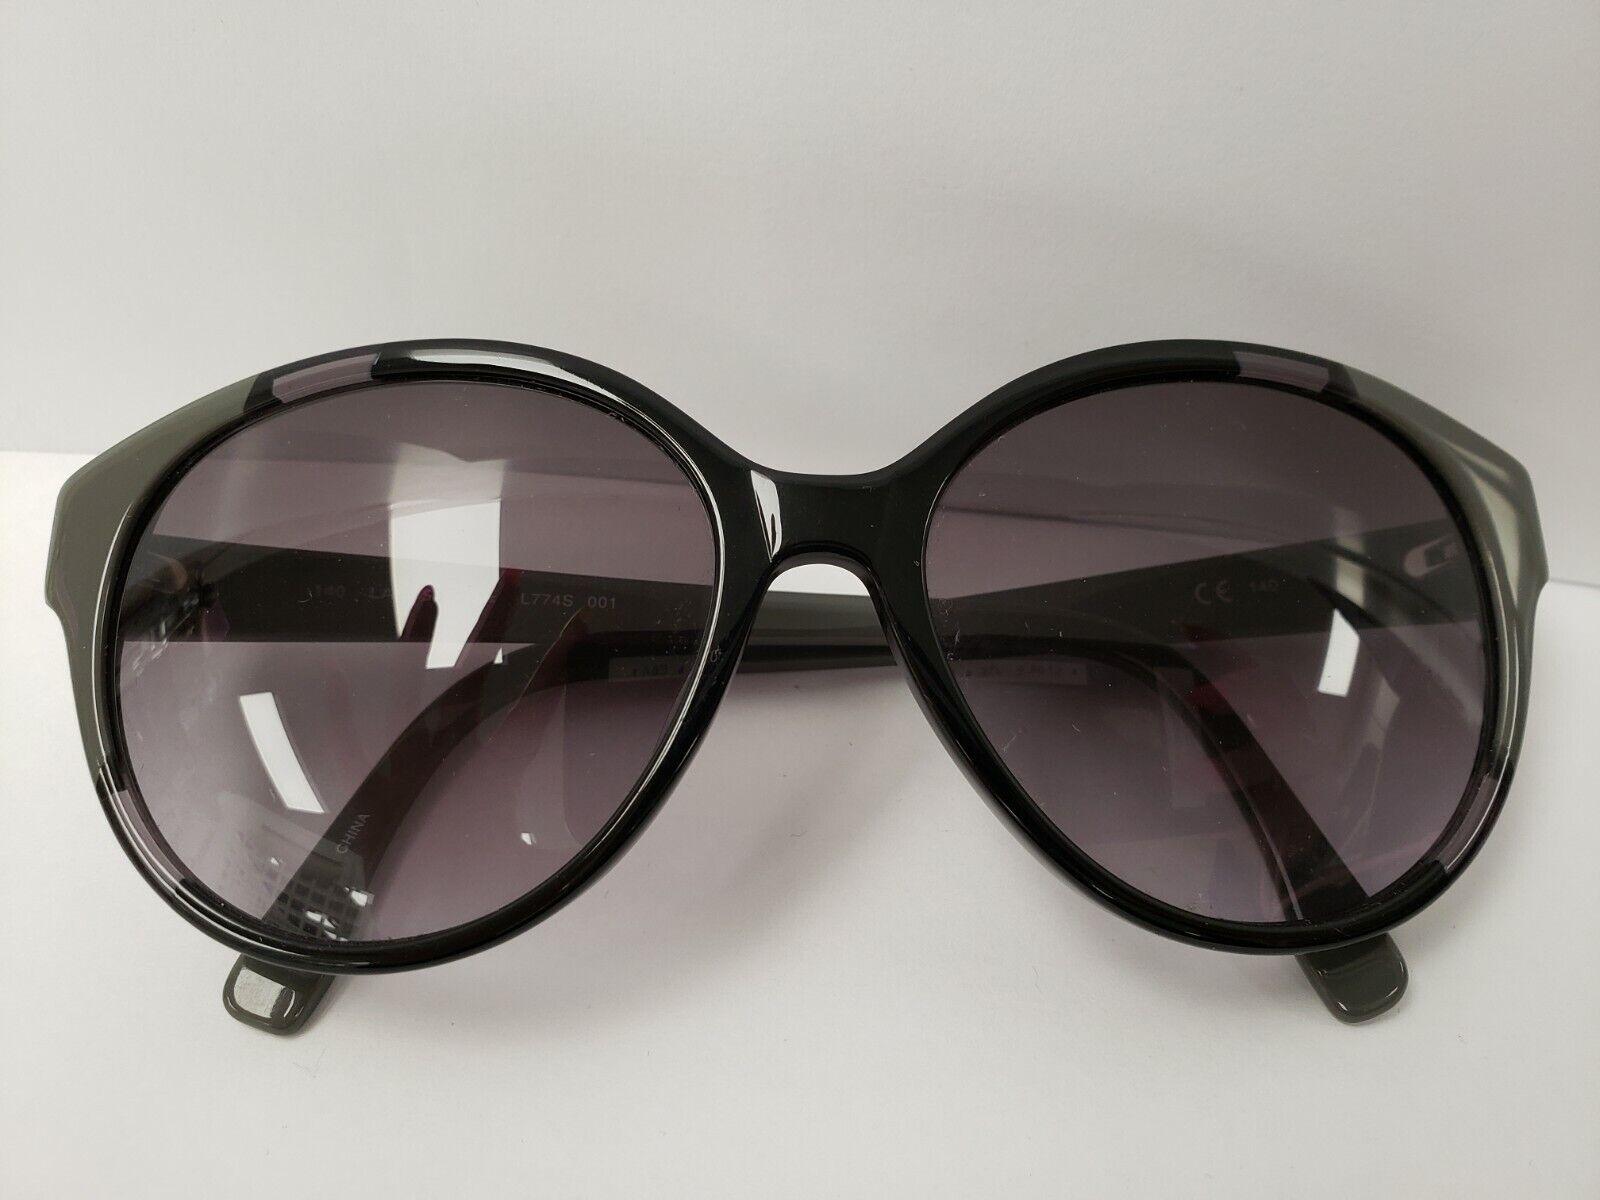 (I-6654) Lacoste Sunglasses-Black